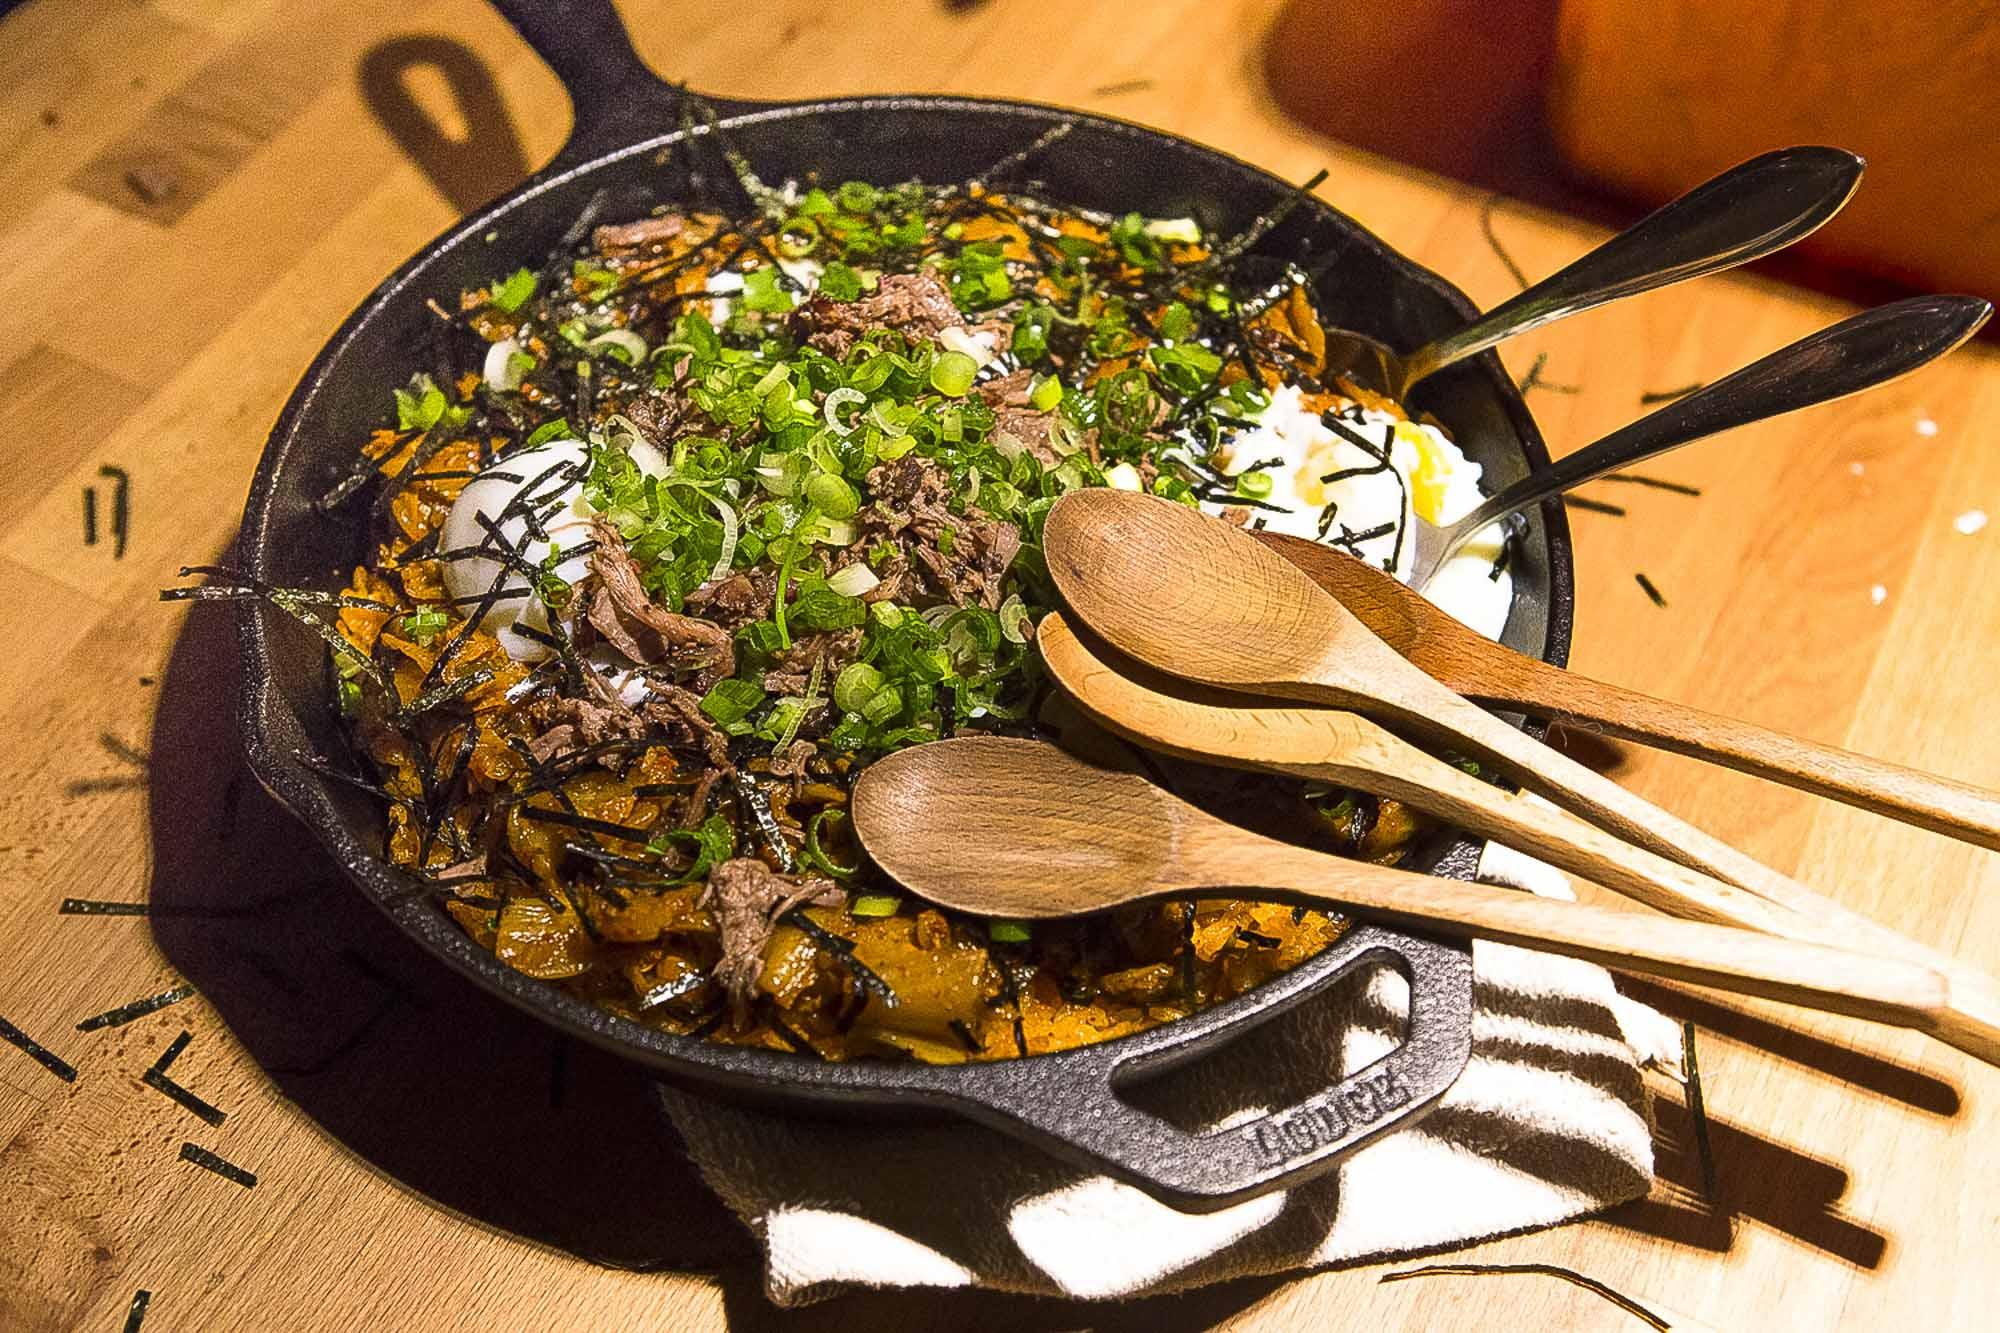 culinaryportfolio-3710.jpg